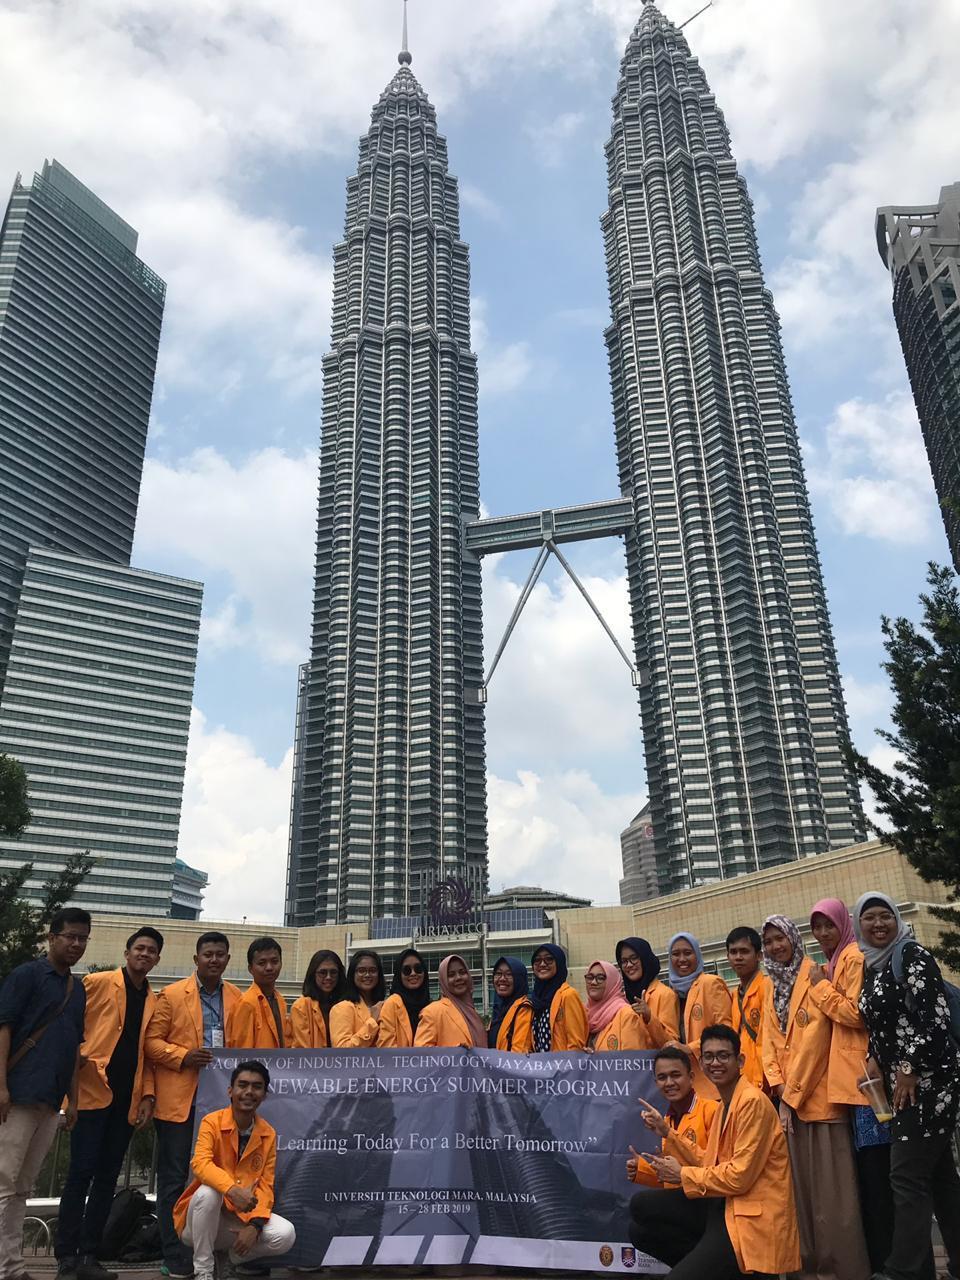 Kunjungan Universitas Jayabaya ke Malaysia